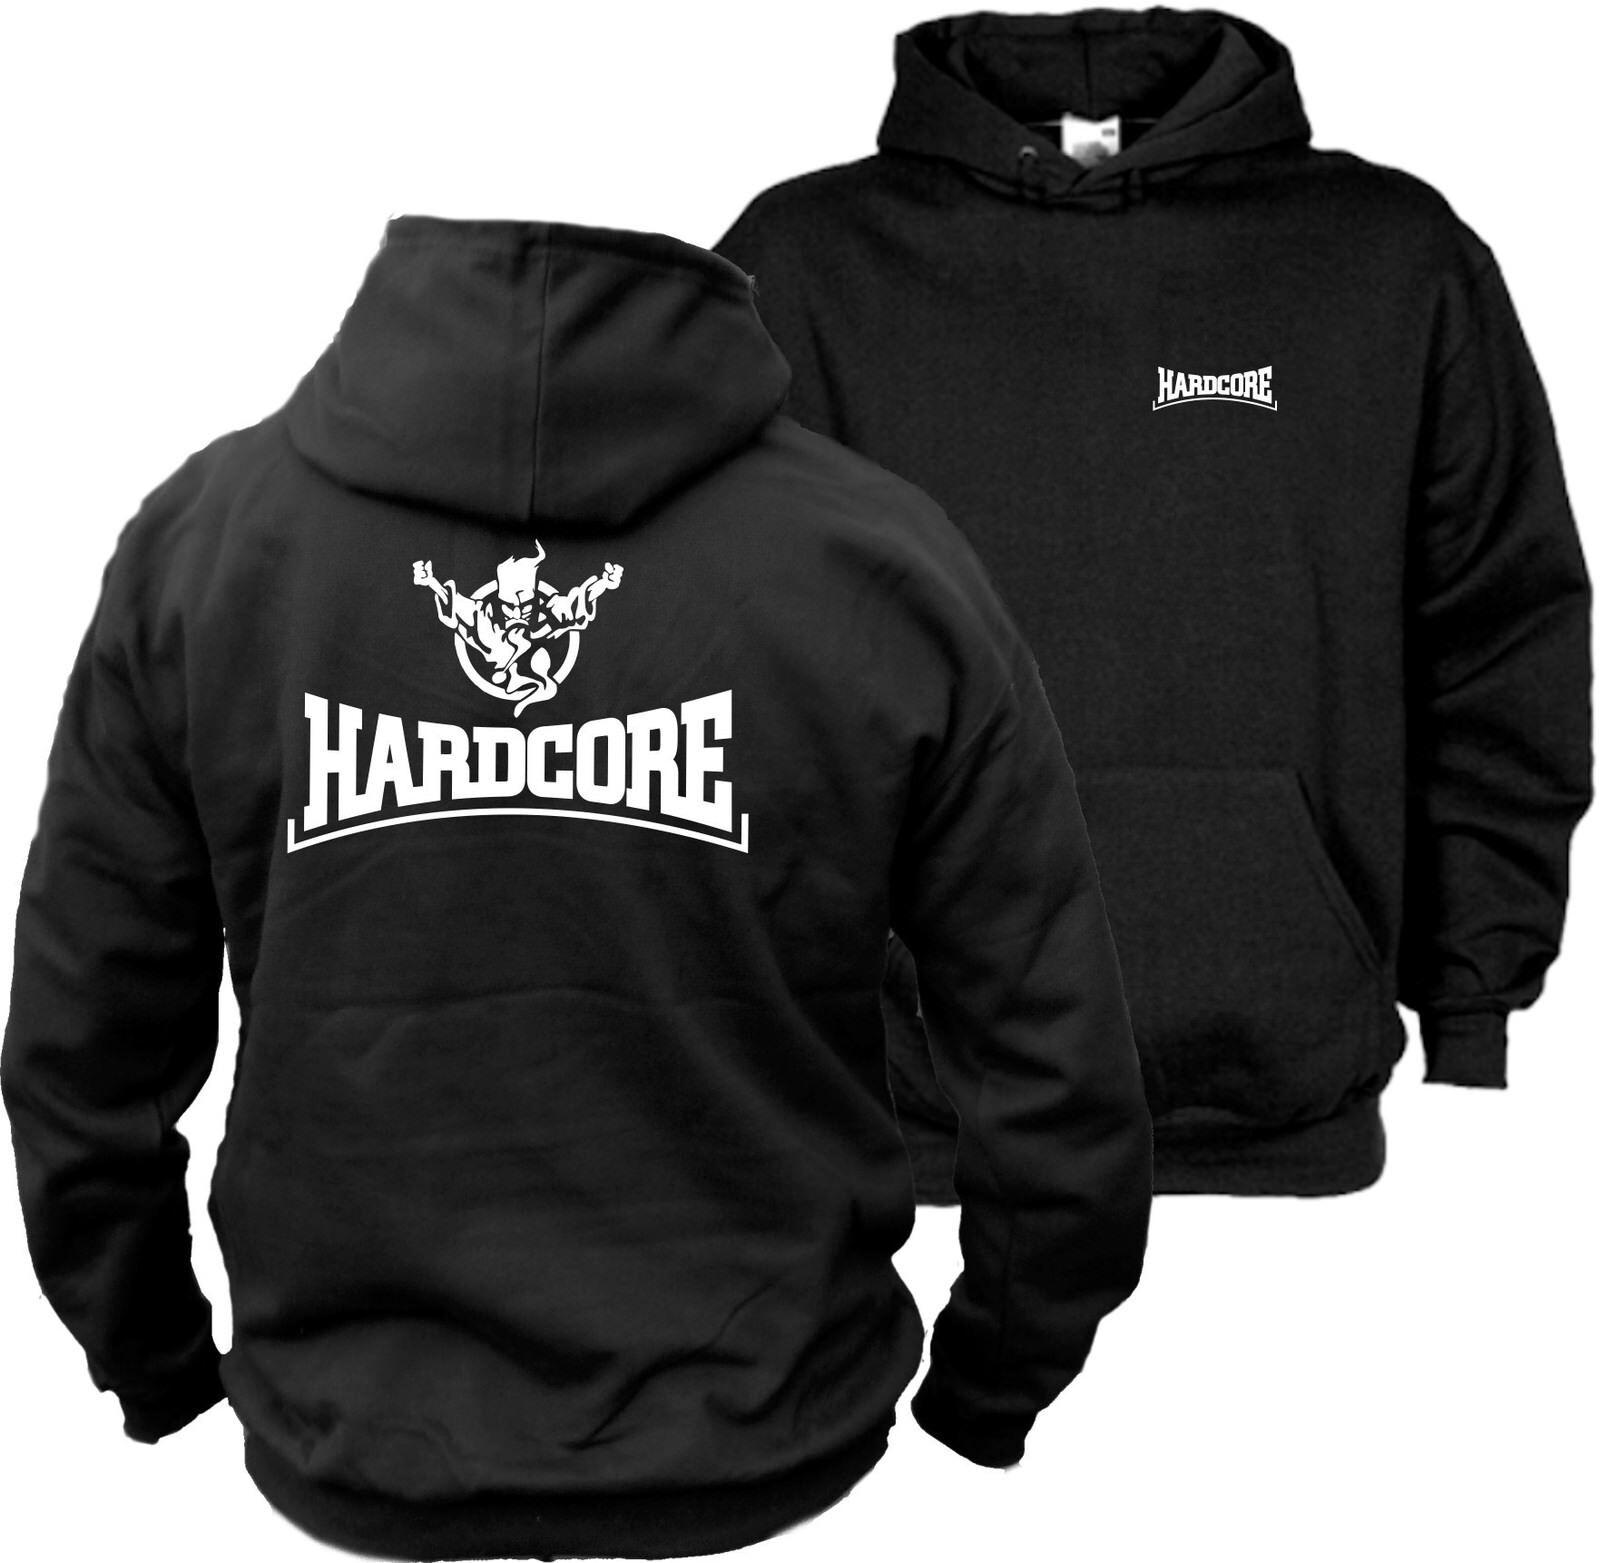 Hardcore Capuche hoodie Motif (6) gabber-Wizzard Angerfist-Aramco hoodie Capuche fd2385